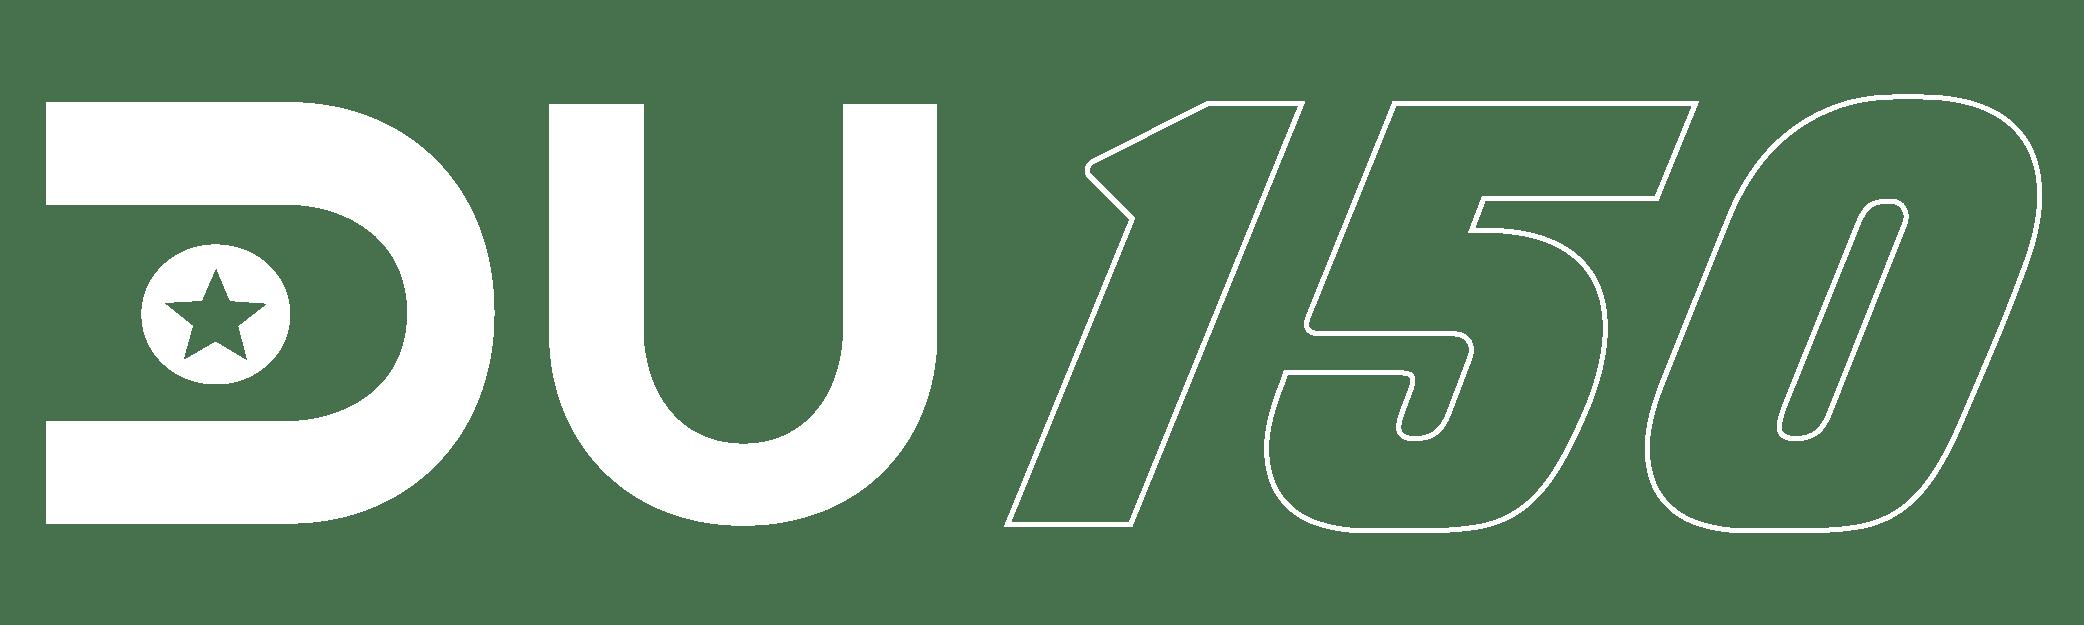 DU150 White Logo